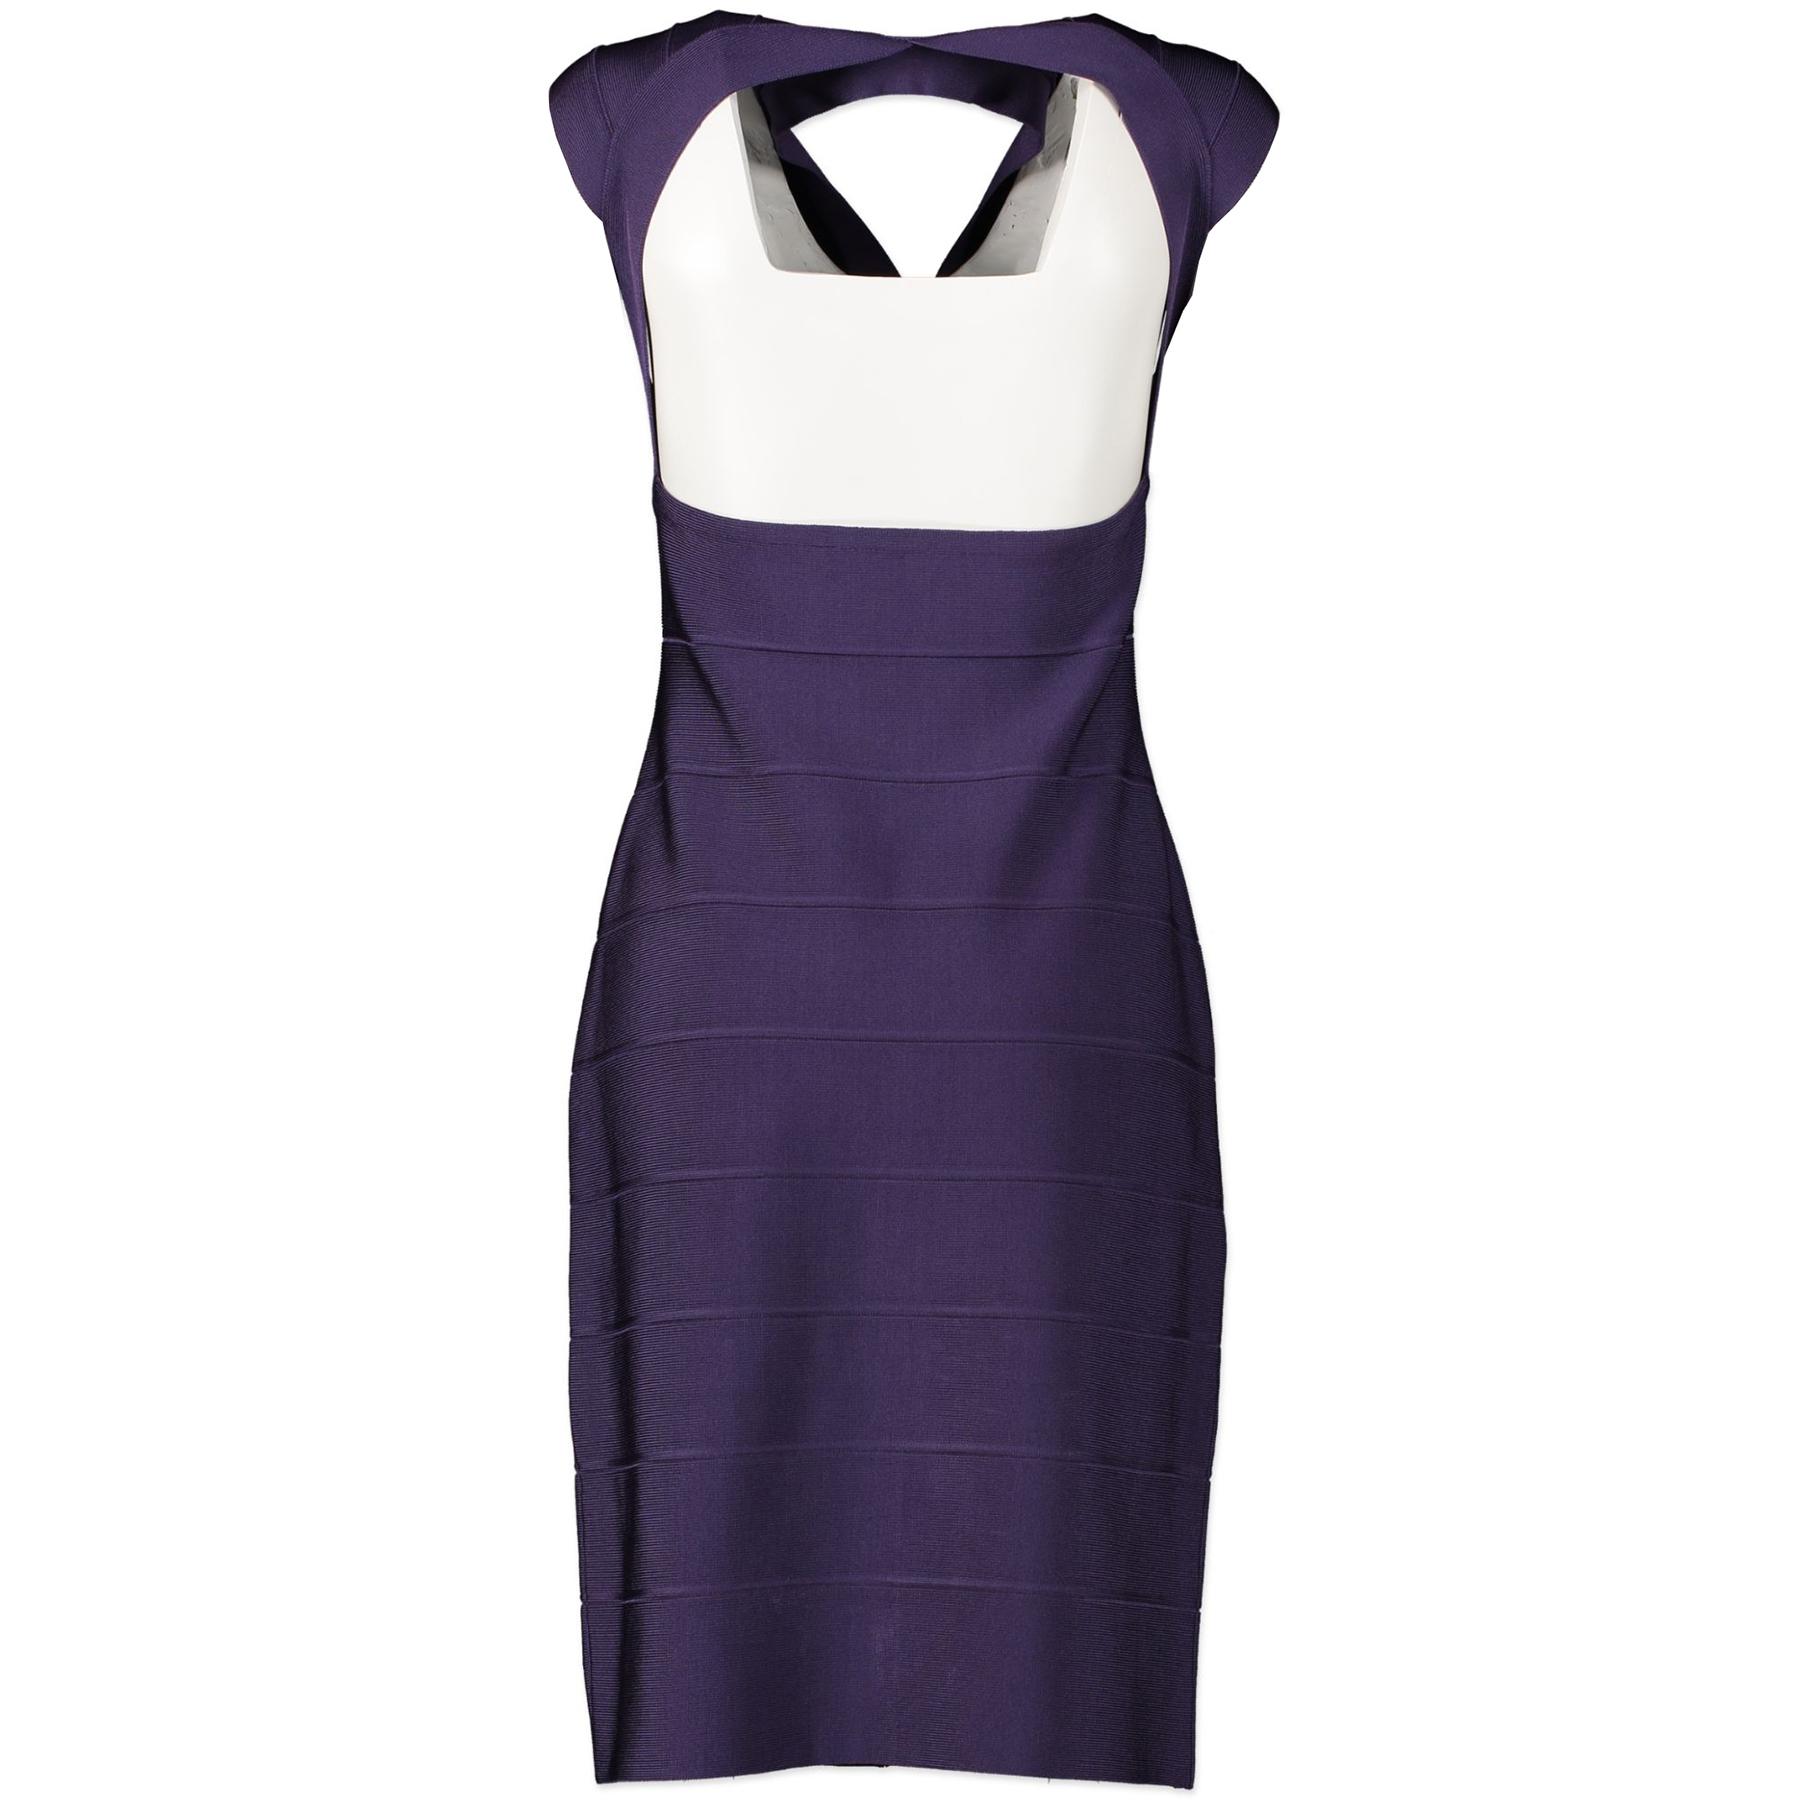 Herve Leger Purple Zip Front V-Neck Bandage Dress available for the best price at Labellov secondhand vintage luxury designer store